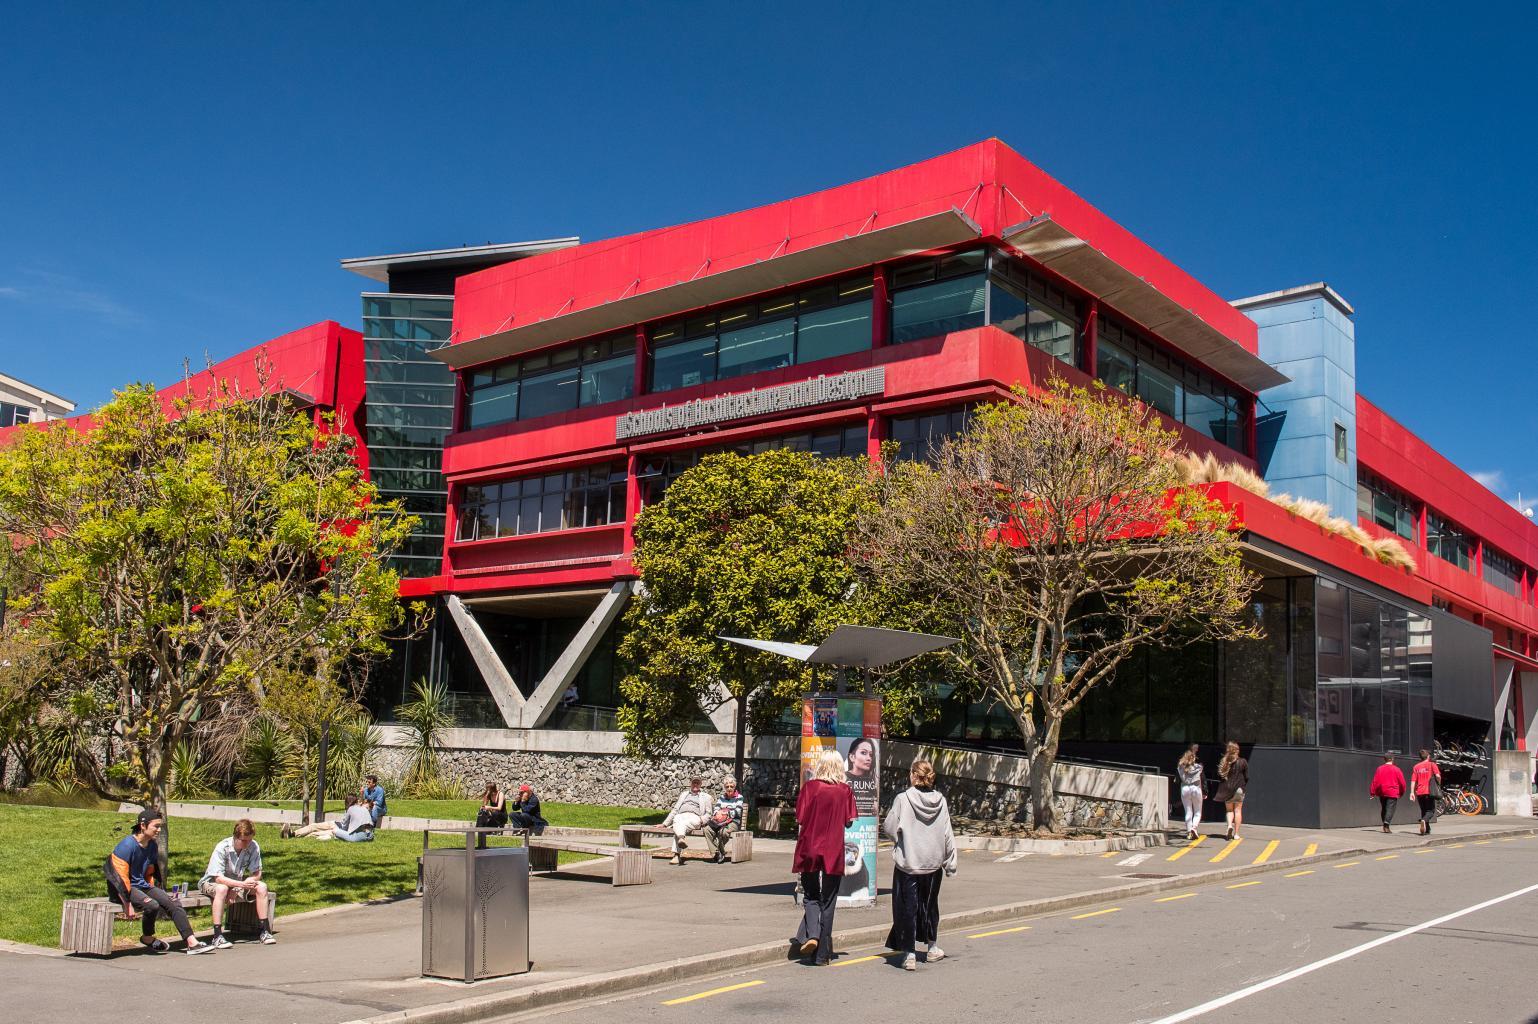 Recuni Uni Pictures VUW_-_Te_Aro_Campus__Faculty_of_Architecture_and_Design_